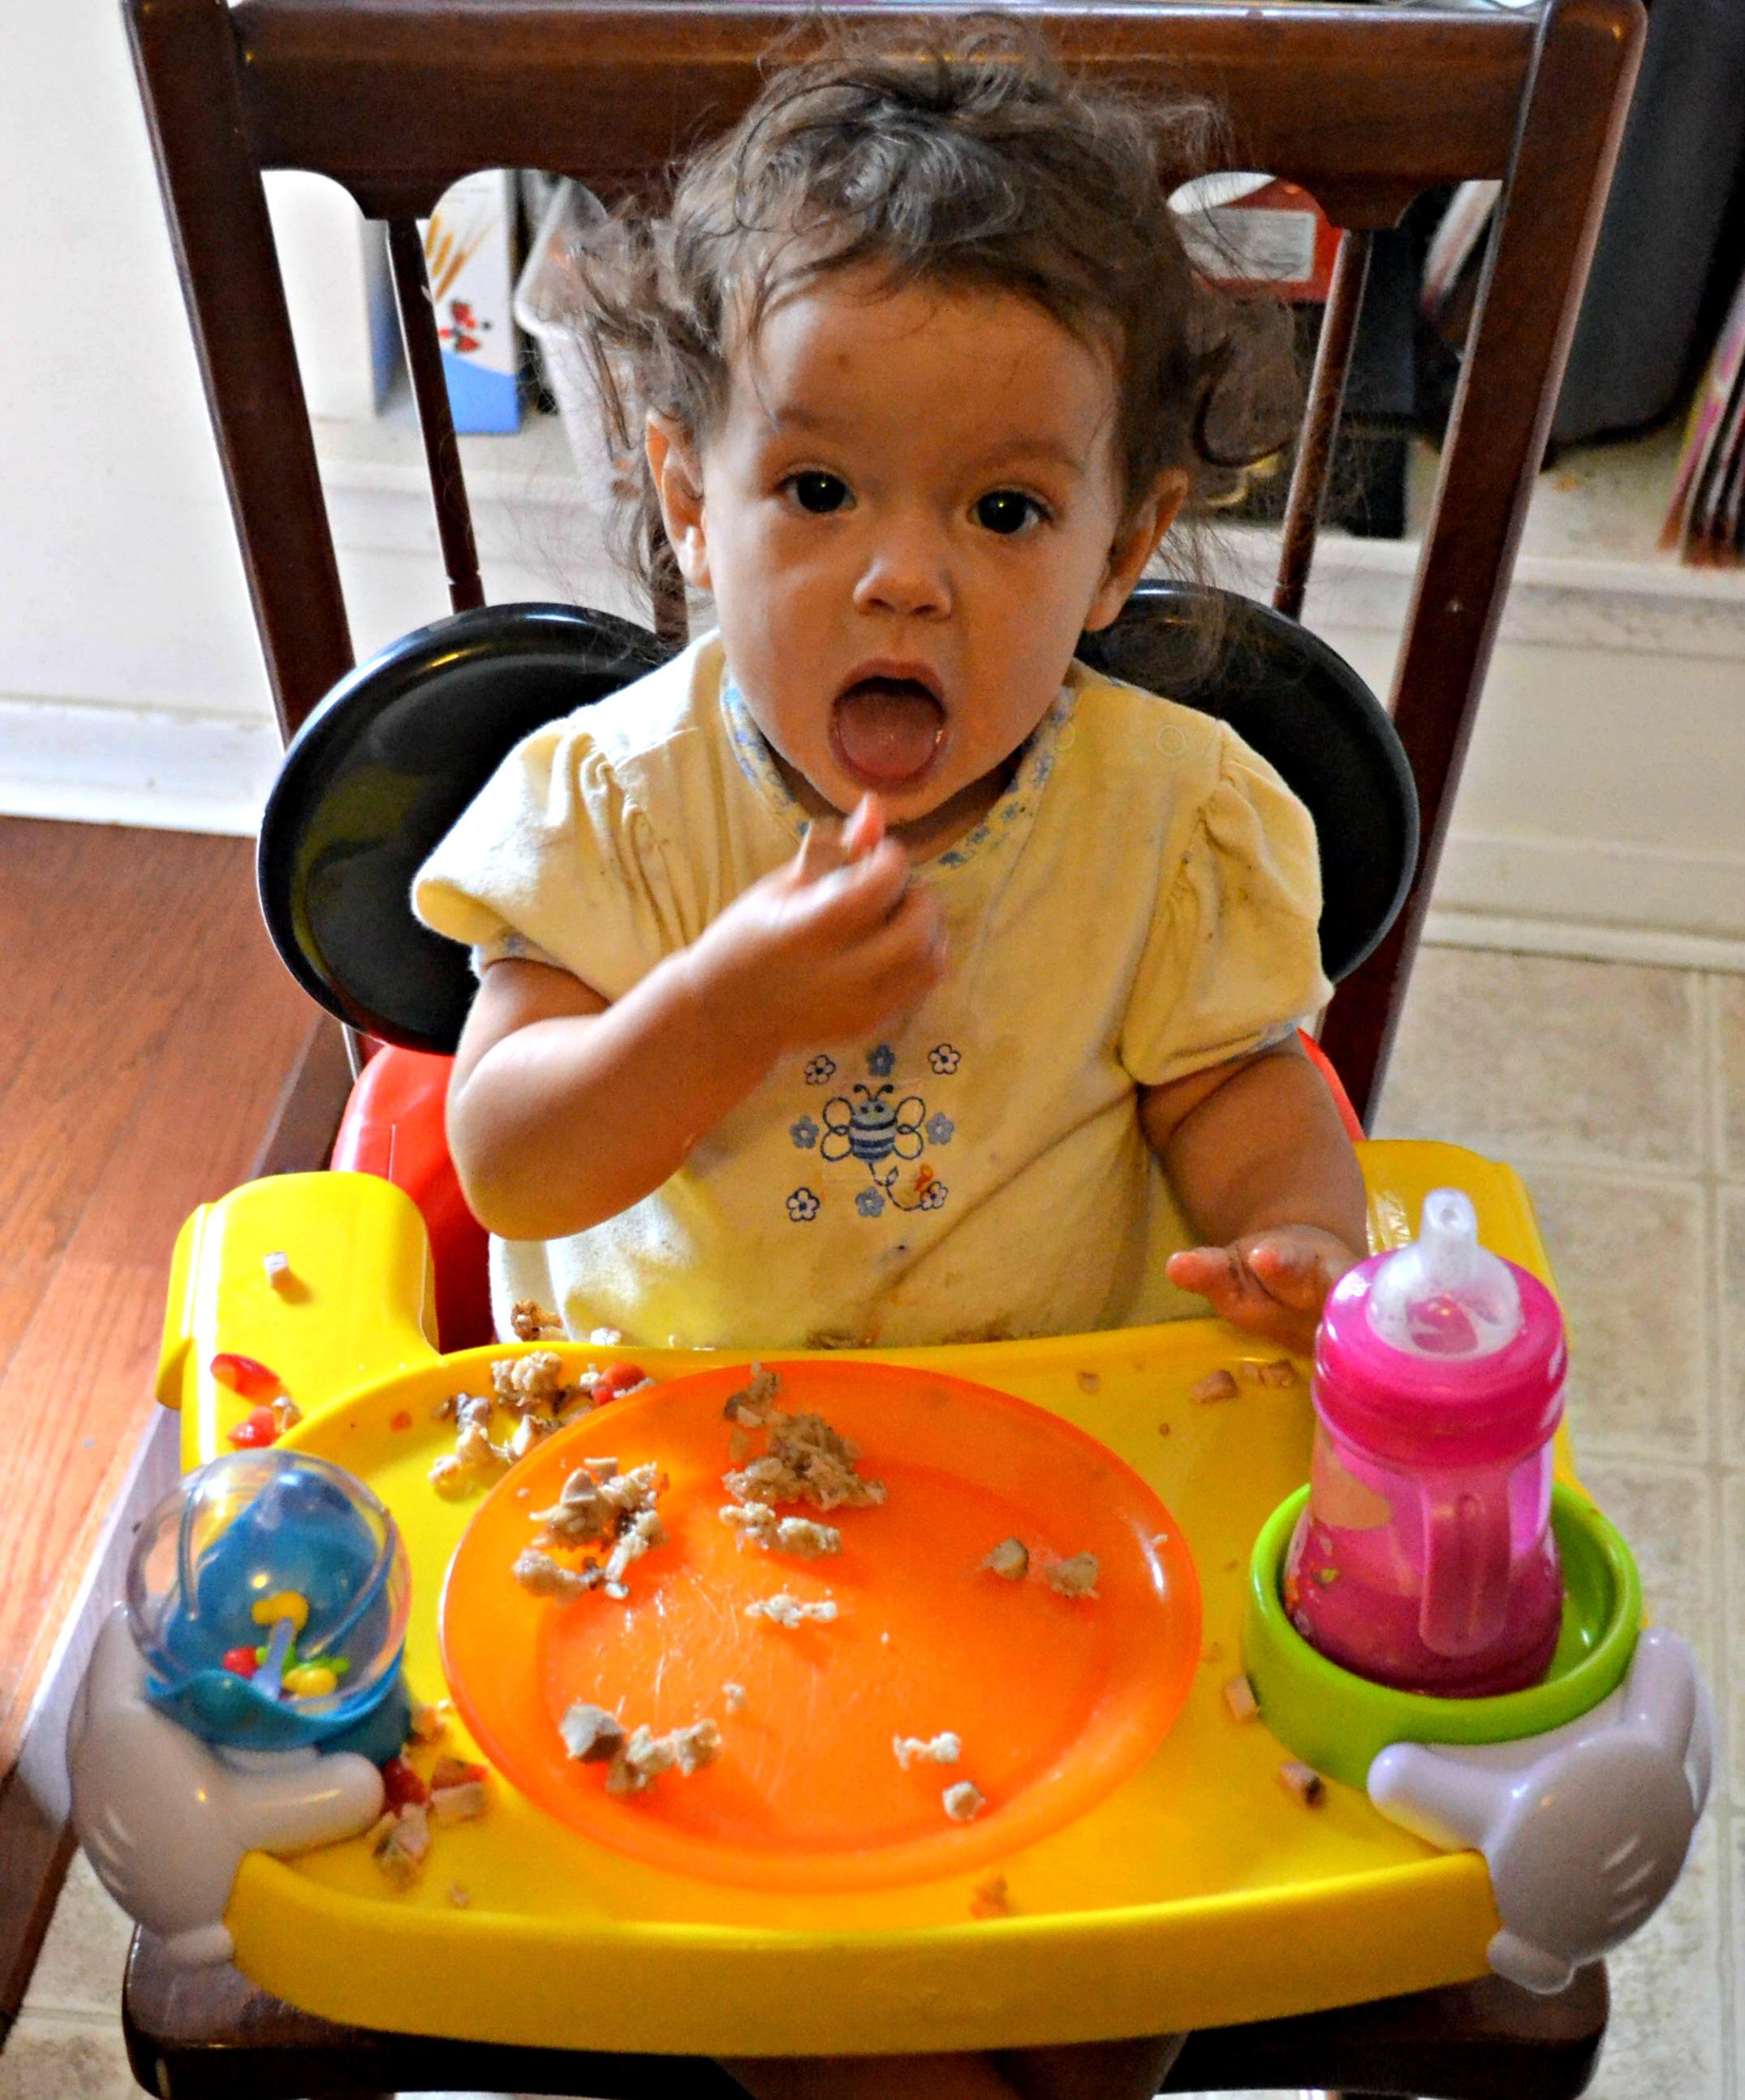 Dining baby